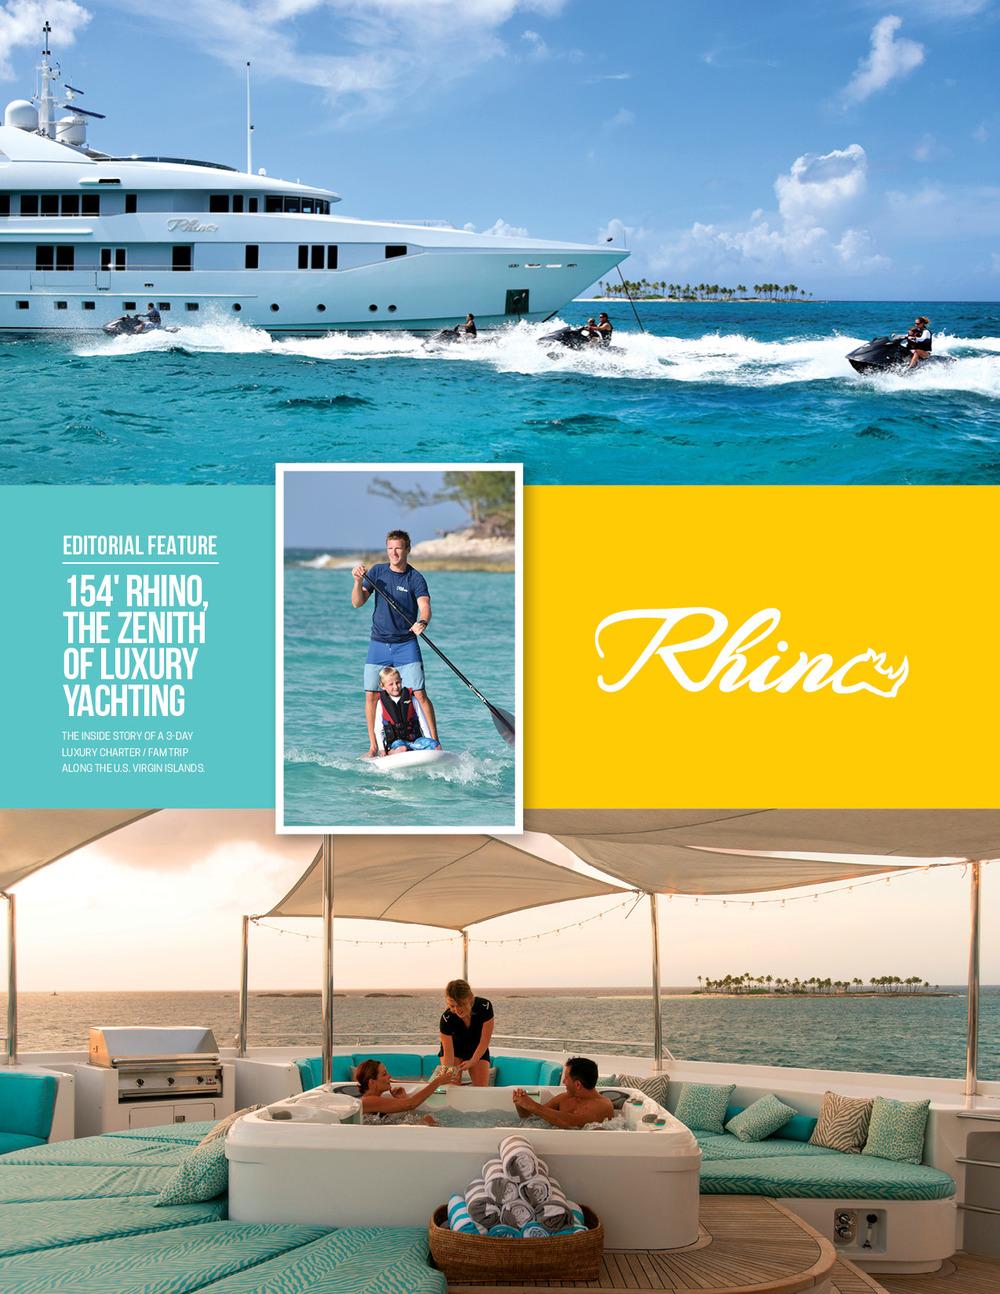 Rhino-Media-Fam-Trip-Article-Natalia-Rodriguez-1